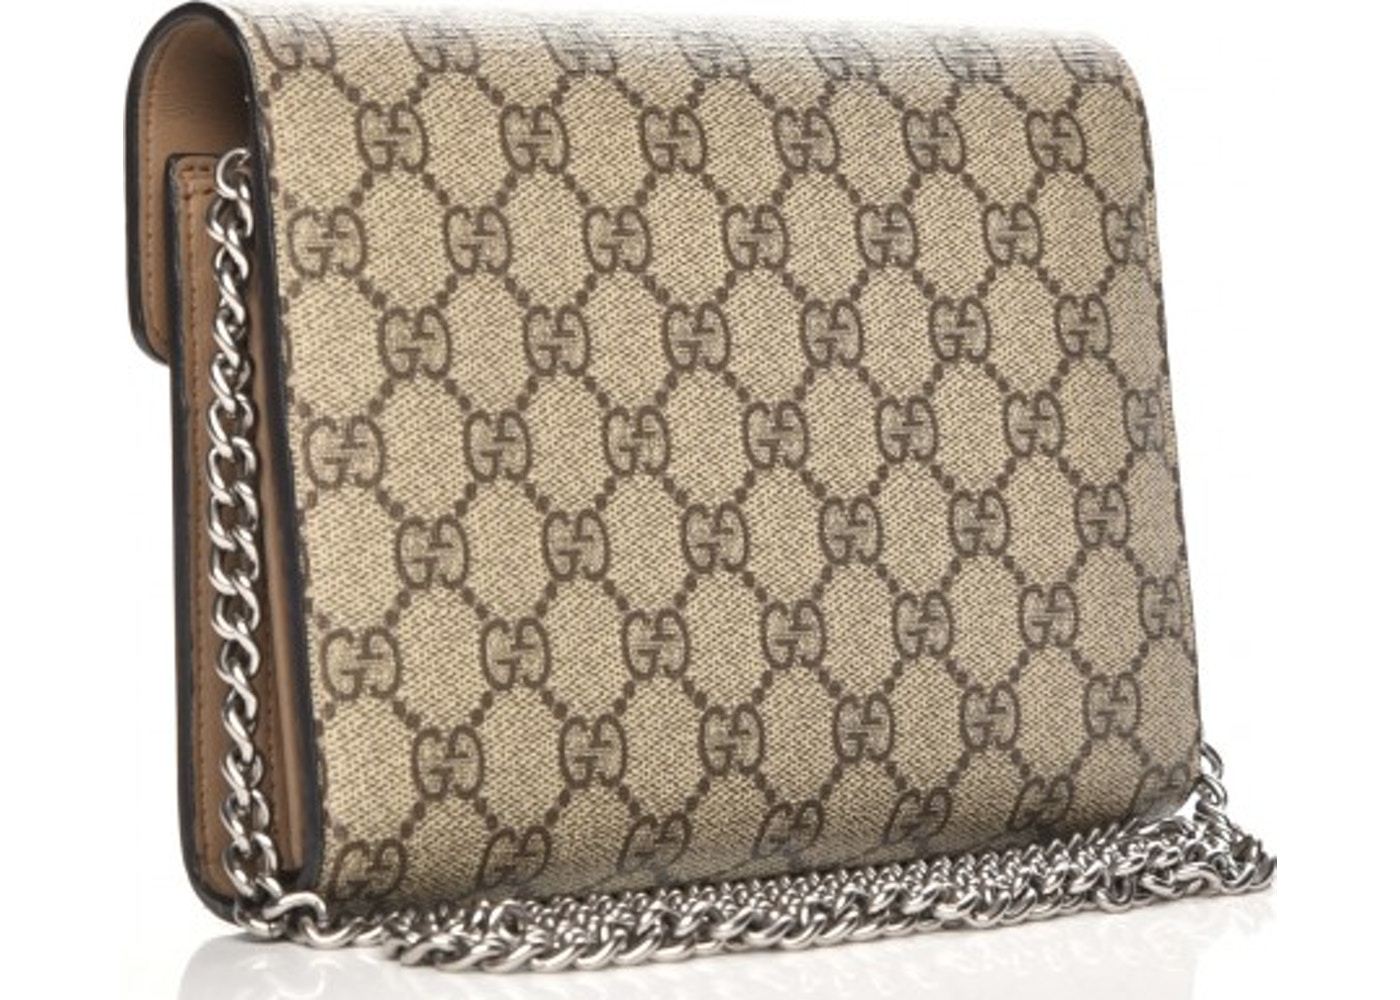 98f14ec83111b2 Gucci Chain Wallet Dionysus Gg Supreme Beige Canvas Cross Body Bag. GUCCI  GG Supreme Monogram Blooms Print ...